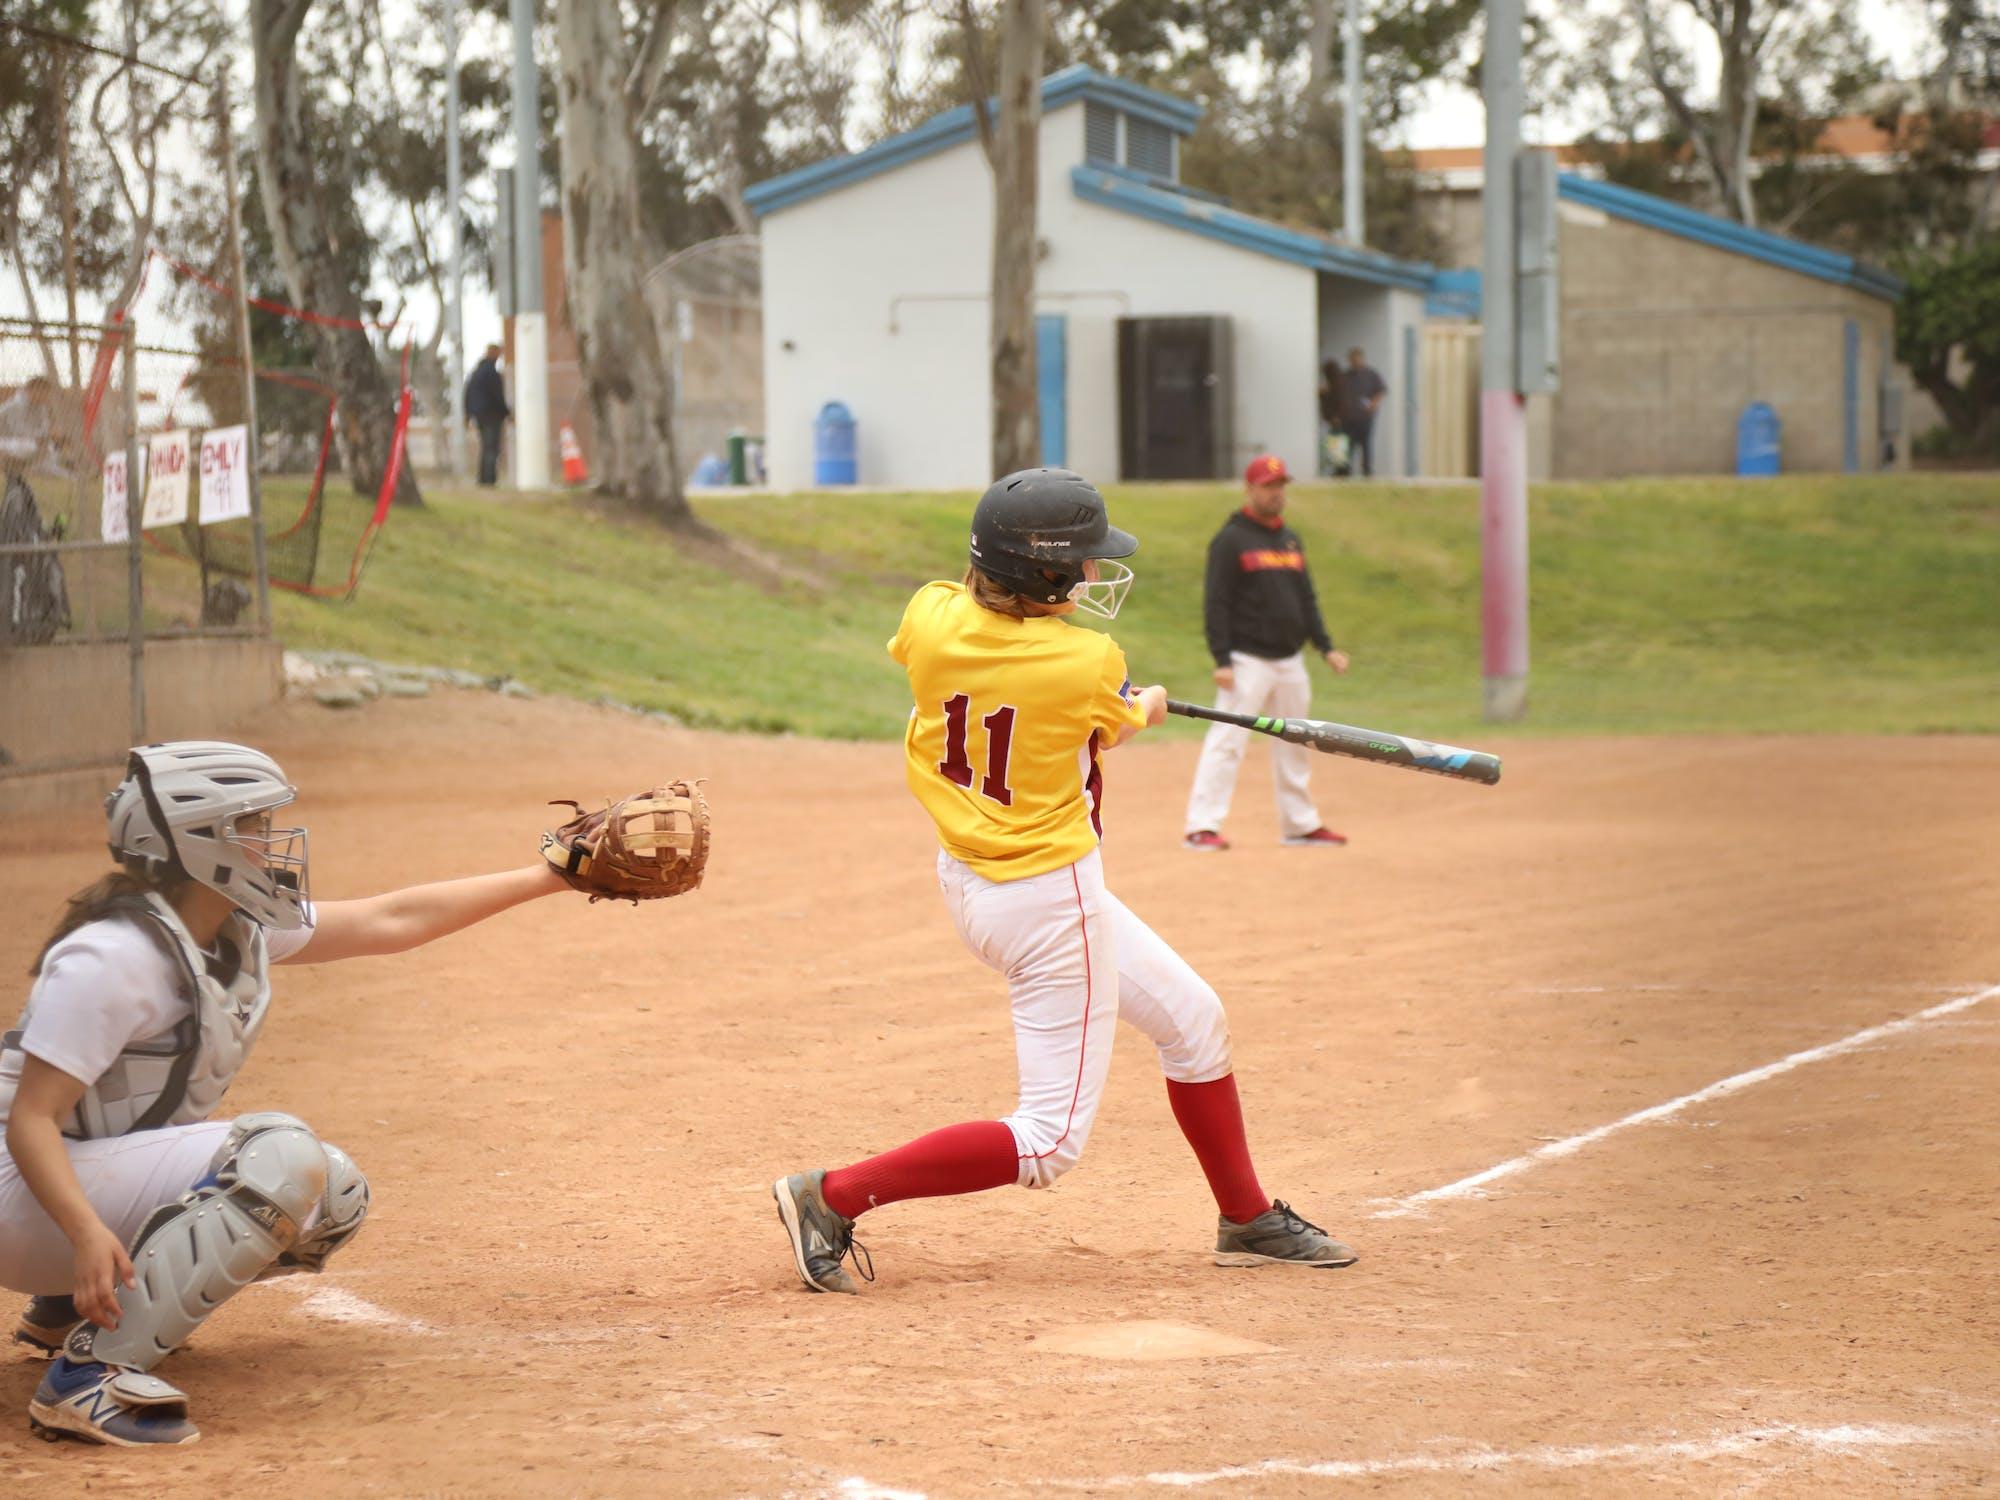 Softball player swinging bat